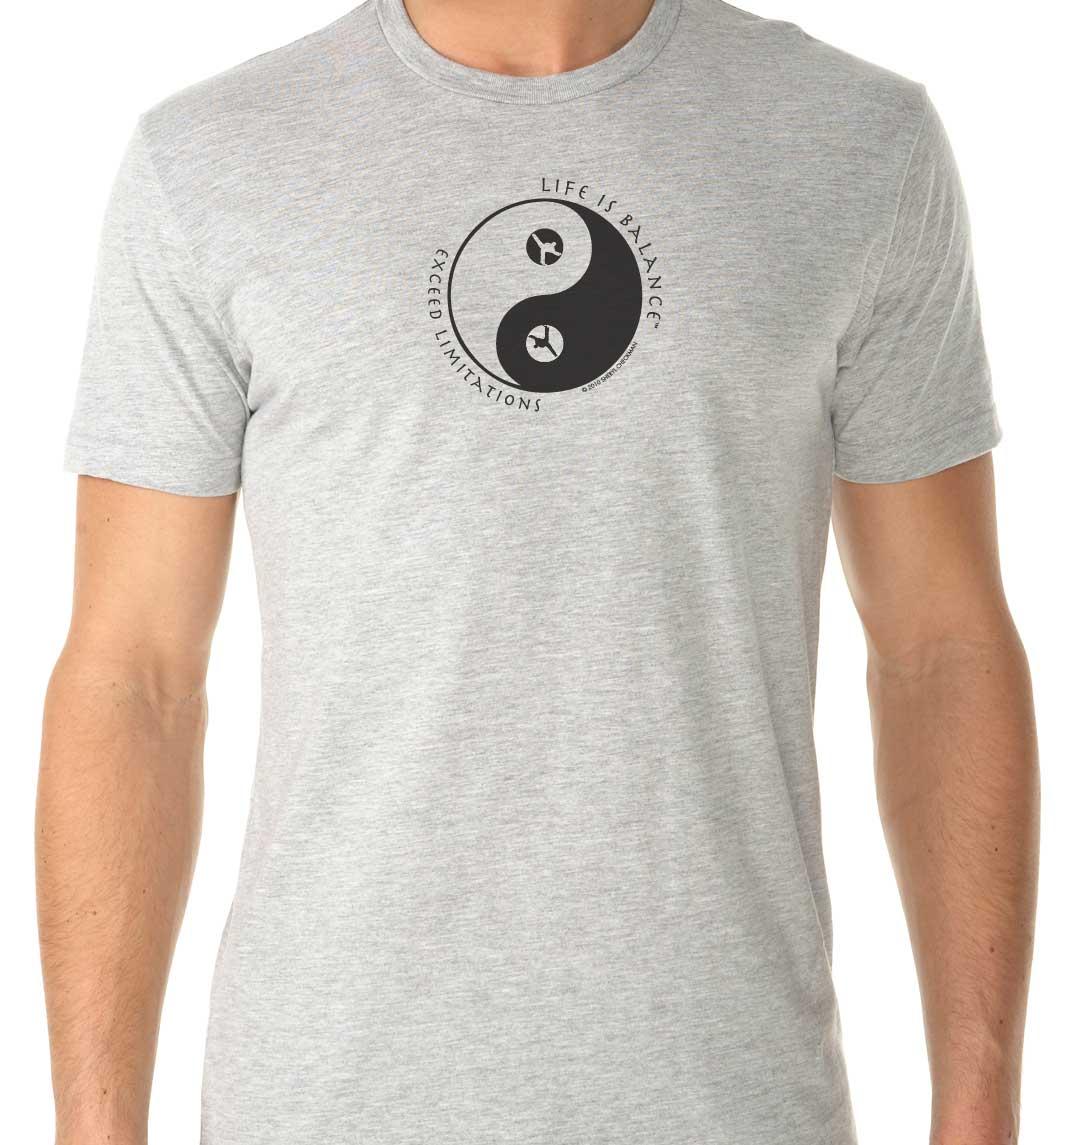 Men's short sleeve martial arts t-shirt (heather gray)